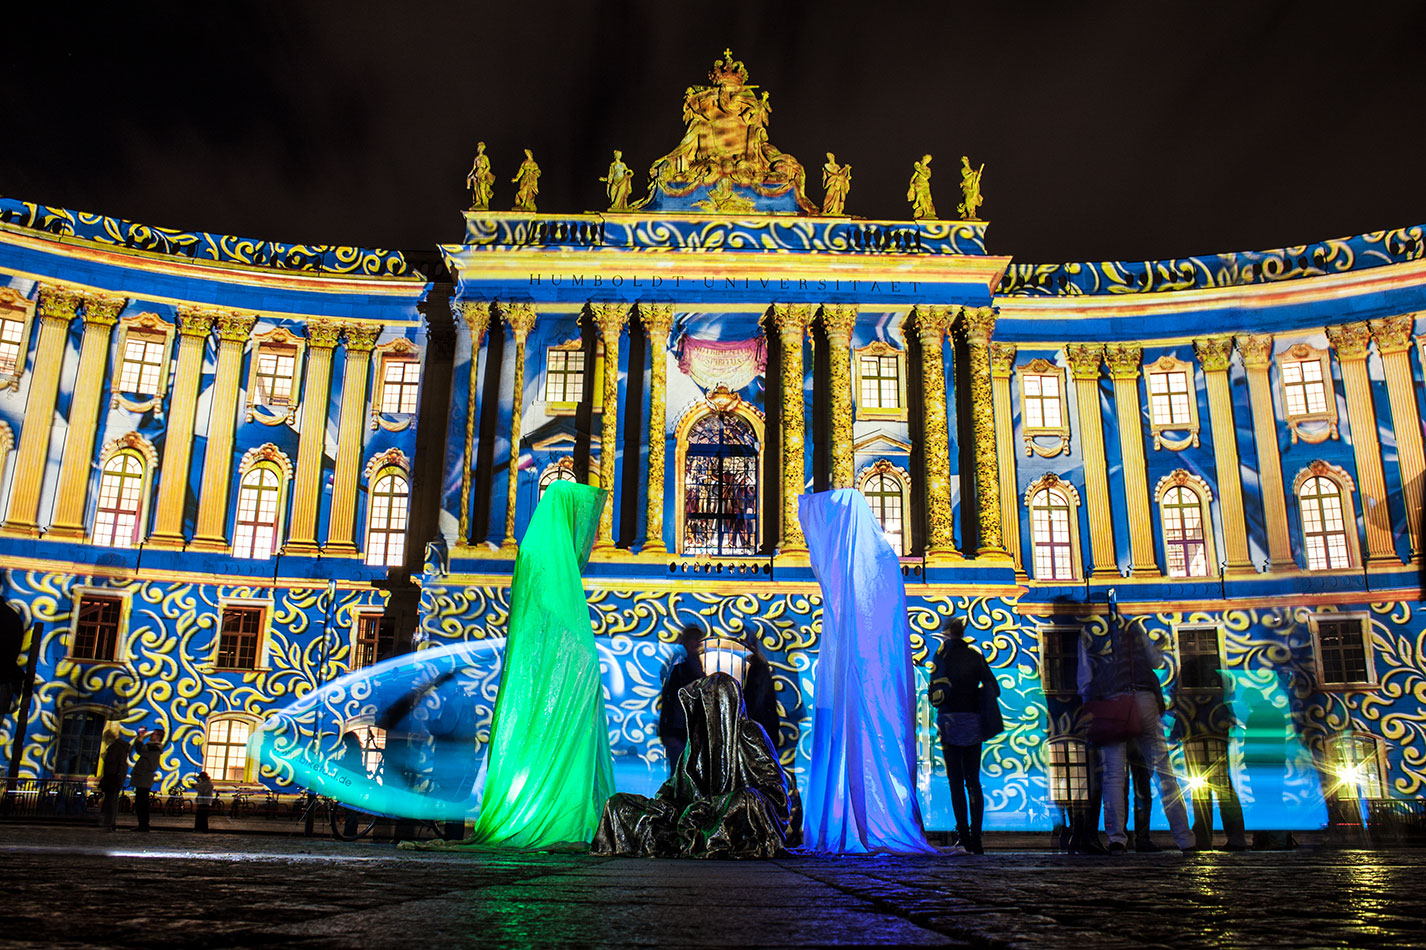 festival-of-lights-berlin-humboldt-university-light-art-show-exhibition-lumina-guardians-of-time-manfred-kili-kielnhofer-contemporary-arts-design-sculpture-3413